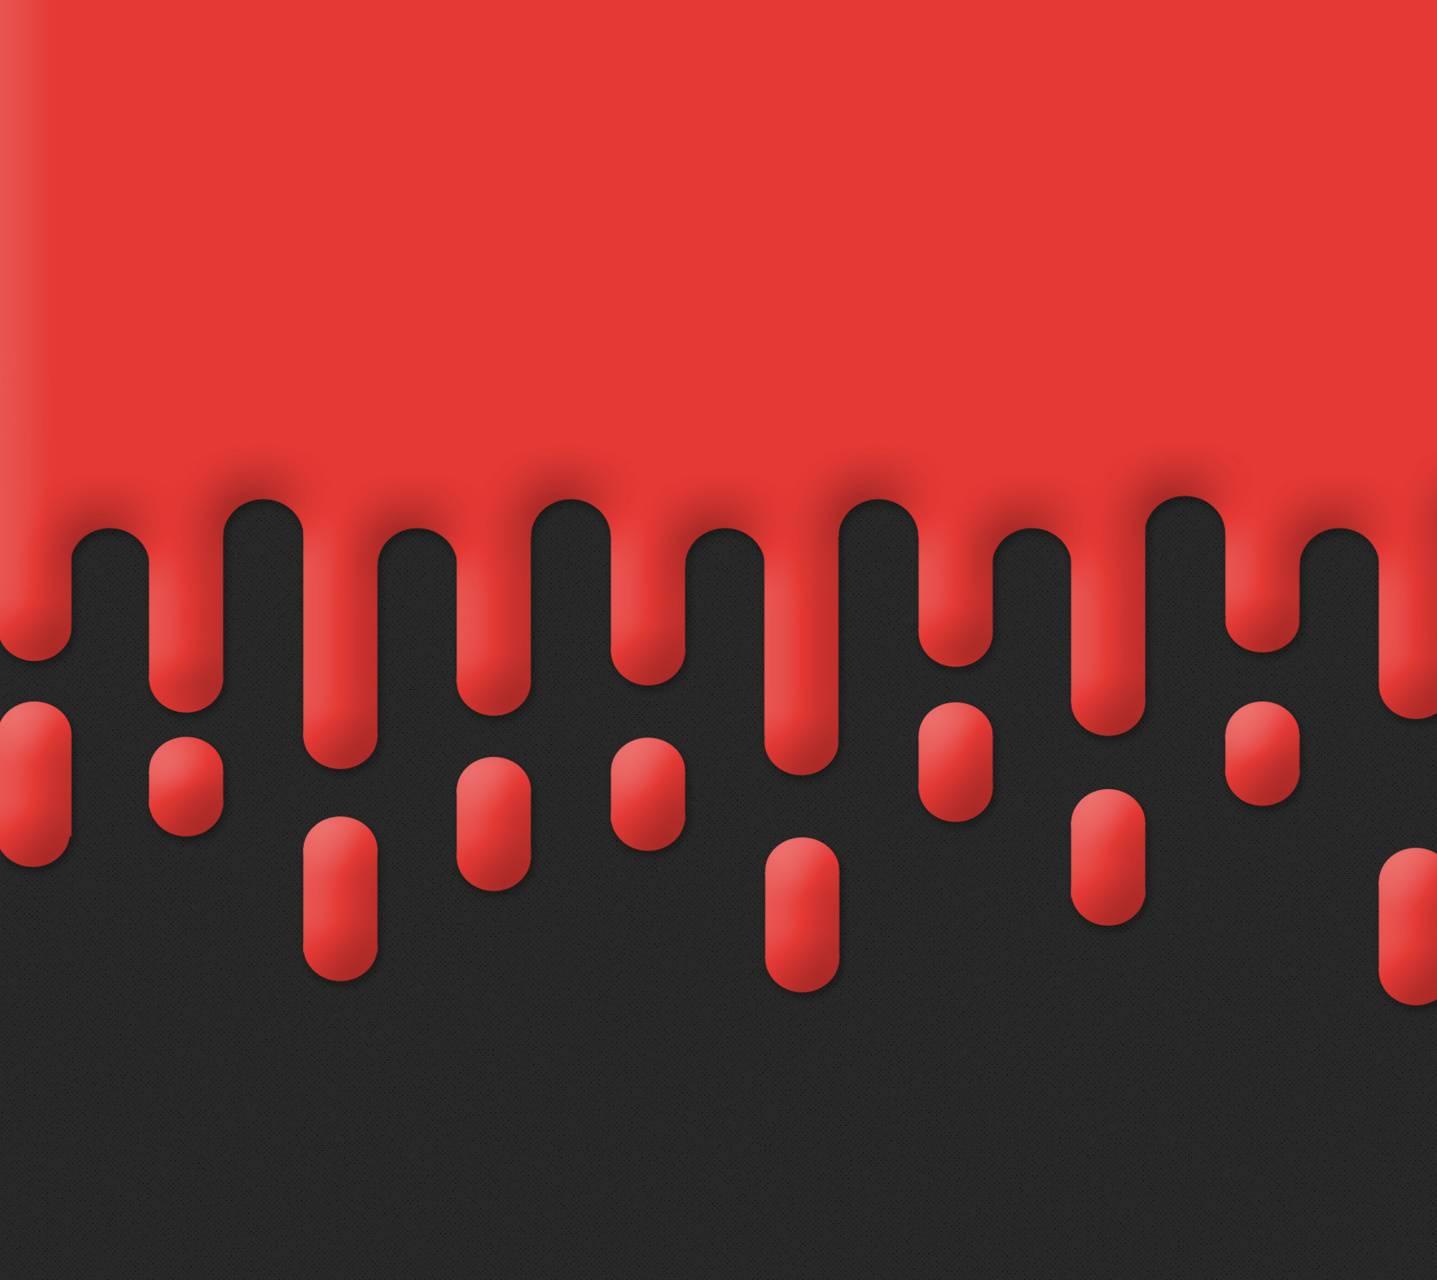 Driplo Red